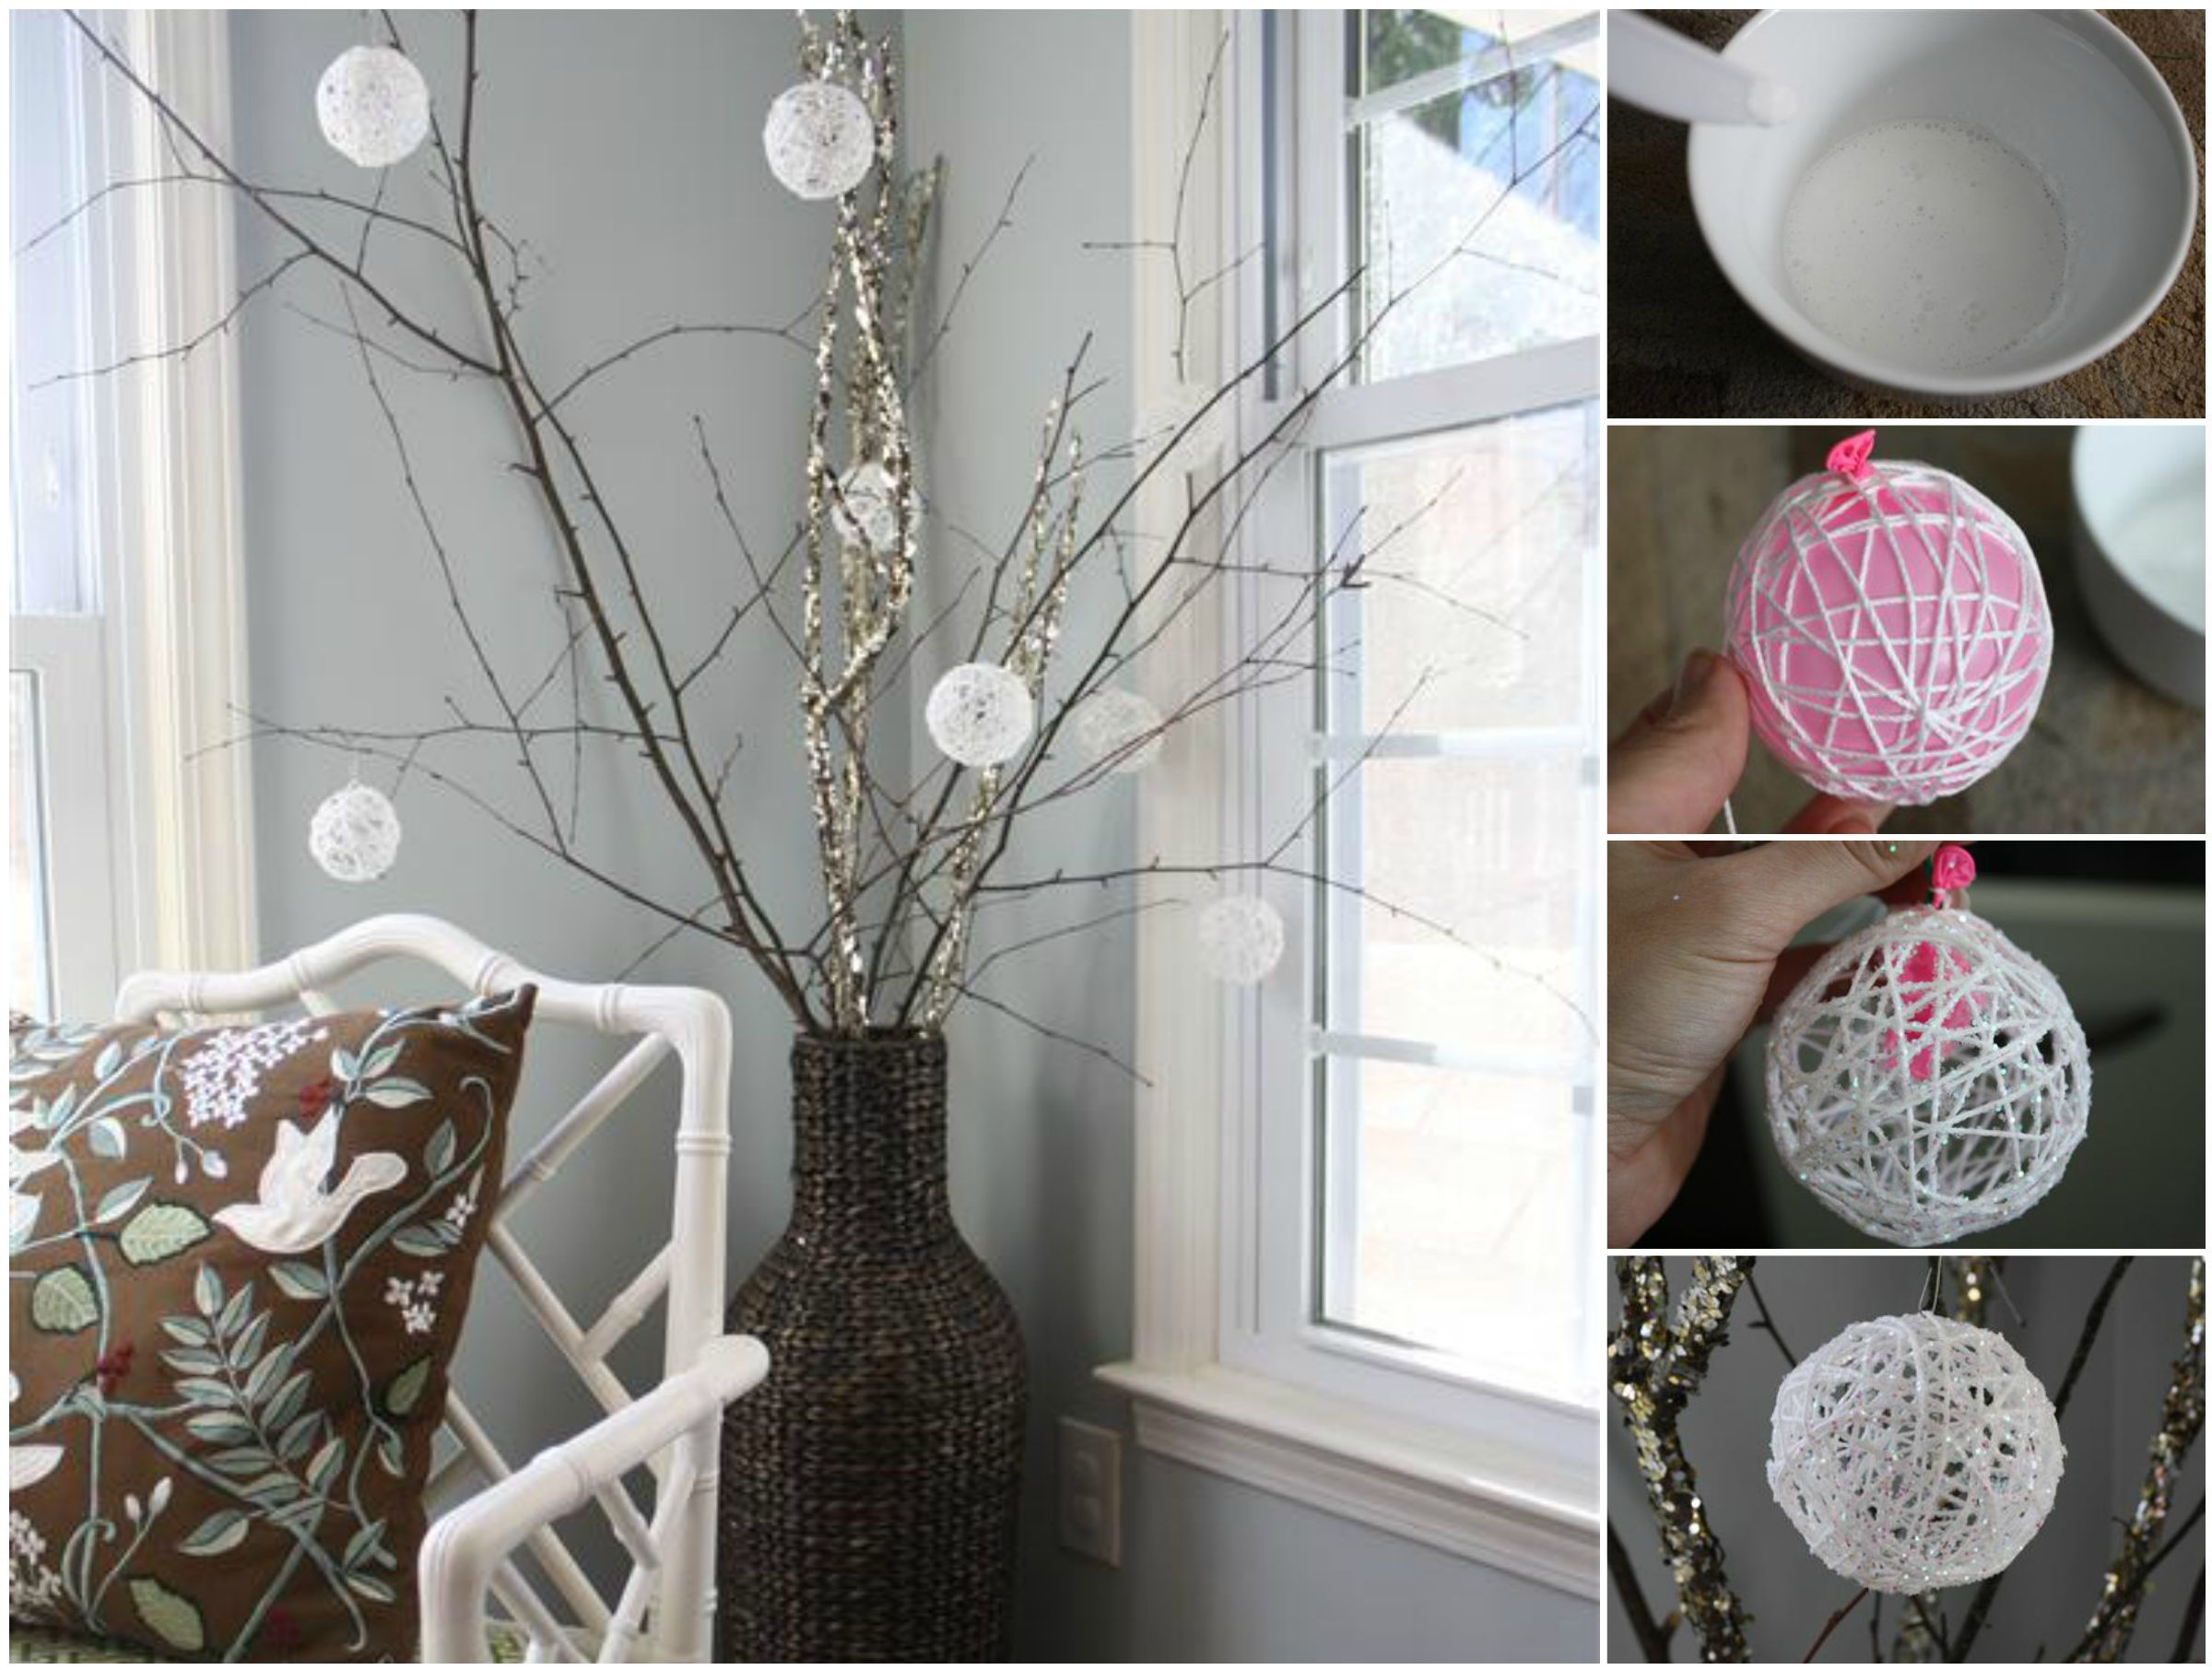 DIY Glittery Snowball Christmas Ornaments